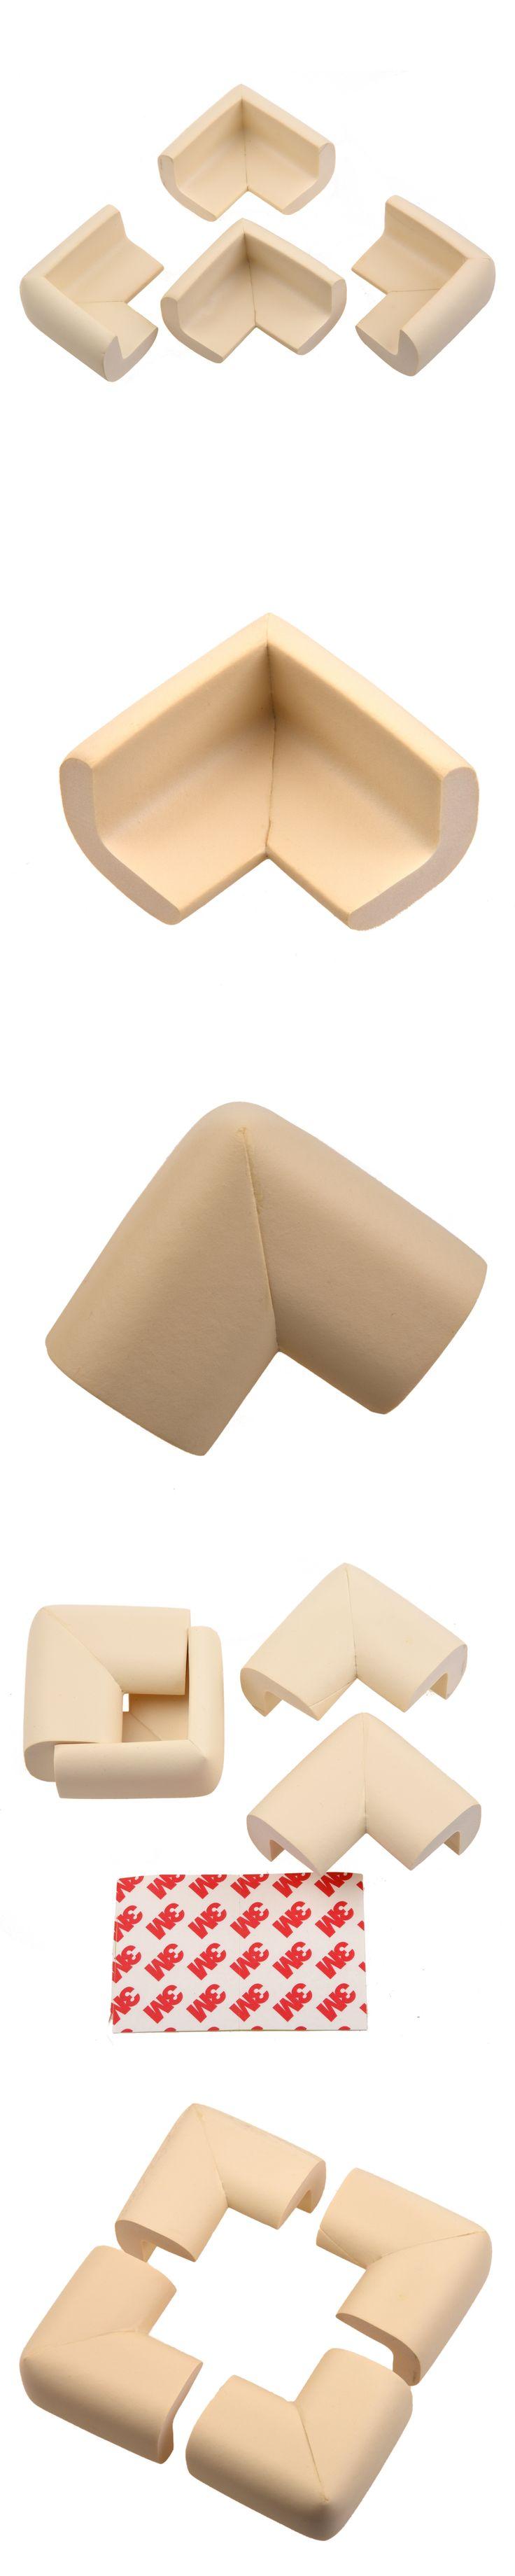 Wholesale Table Desk Shelf Edge Corner Cushion Bumper Baby Safety Guard Protector Beige